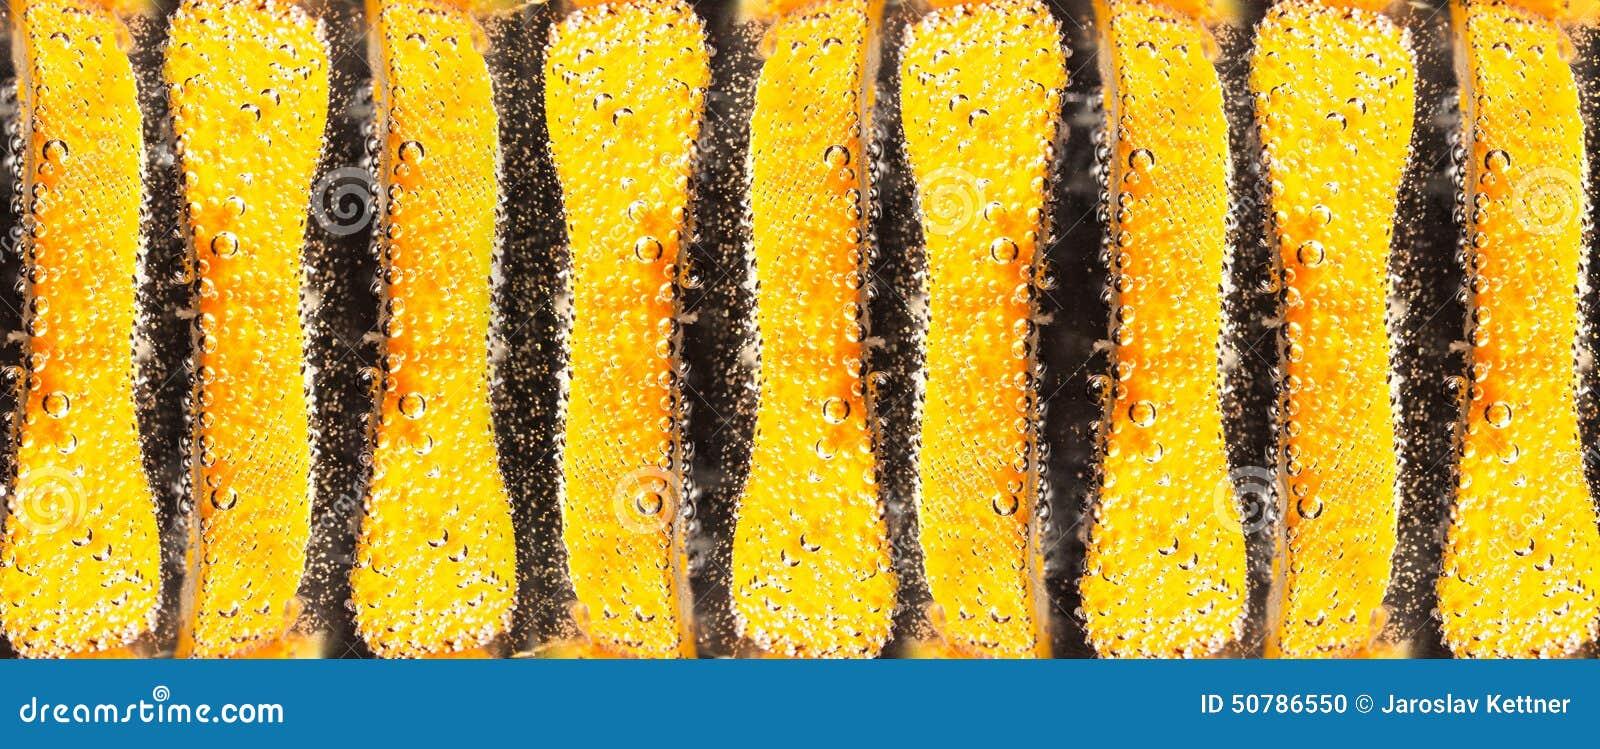 Fruit orange